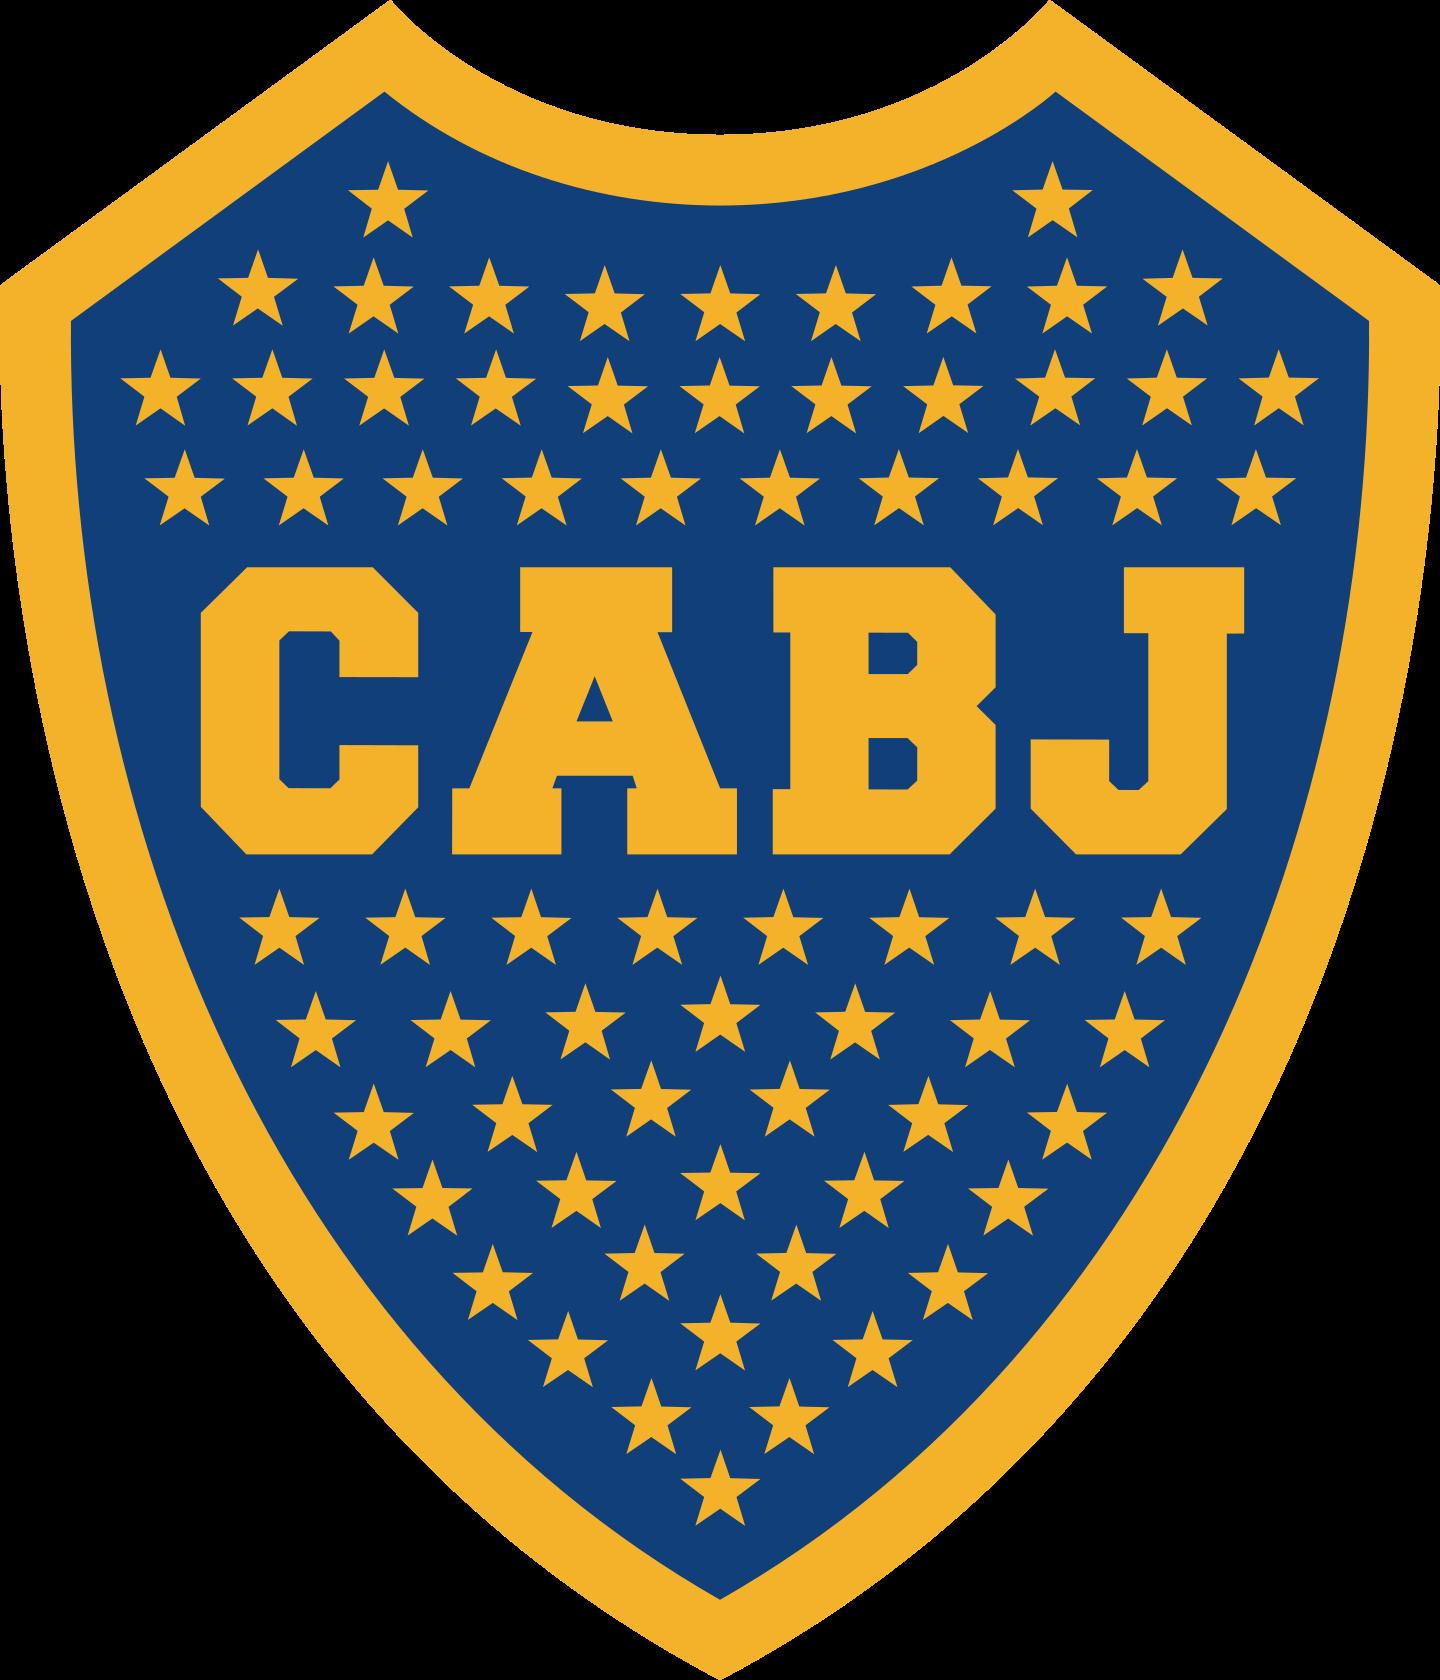 boca juniors logo escudo 2 1 - Boca Juniors Logo - Escudo